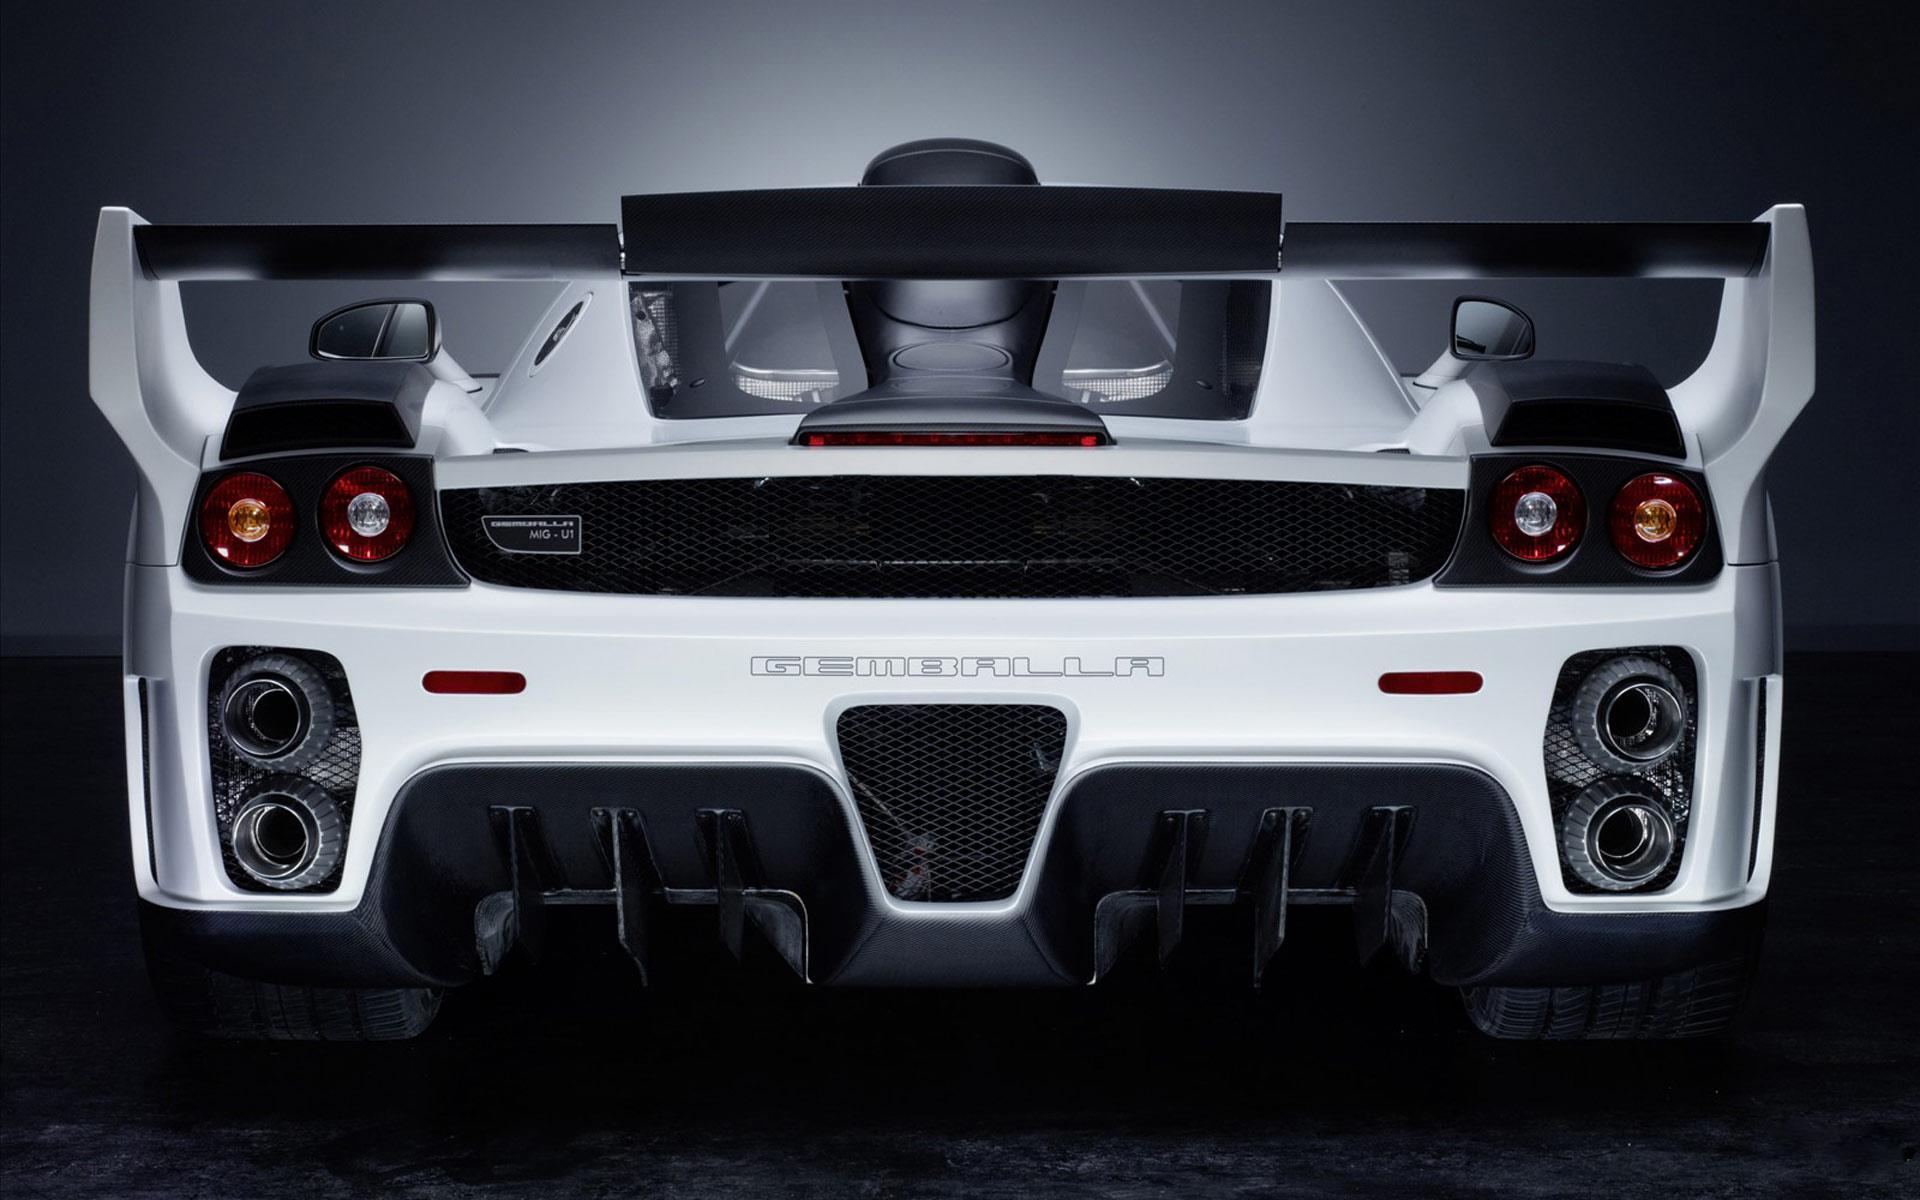 Vehículos - Ferrari  Super Fast Genial Coche Vehículo Fondo de Pantalla